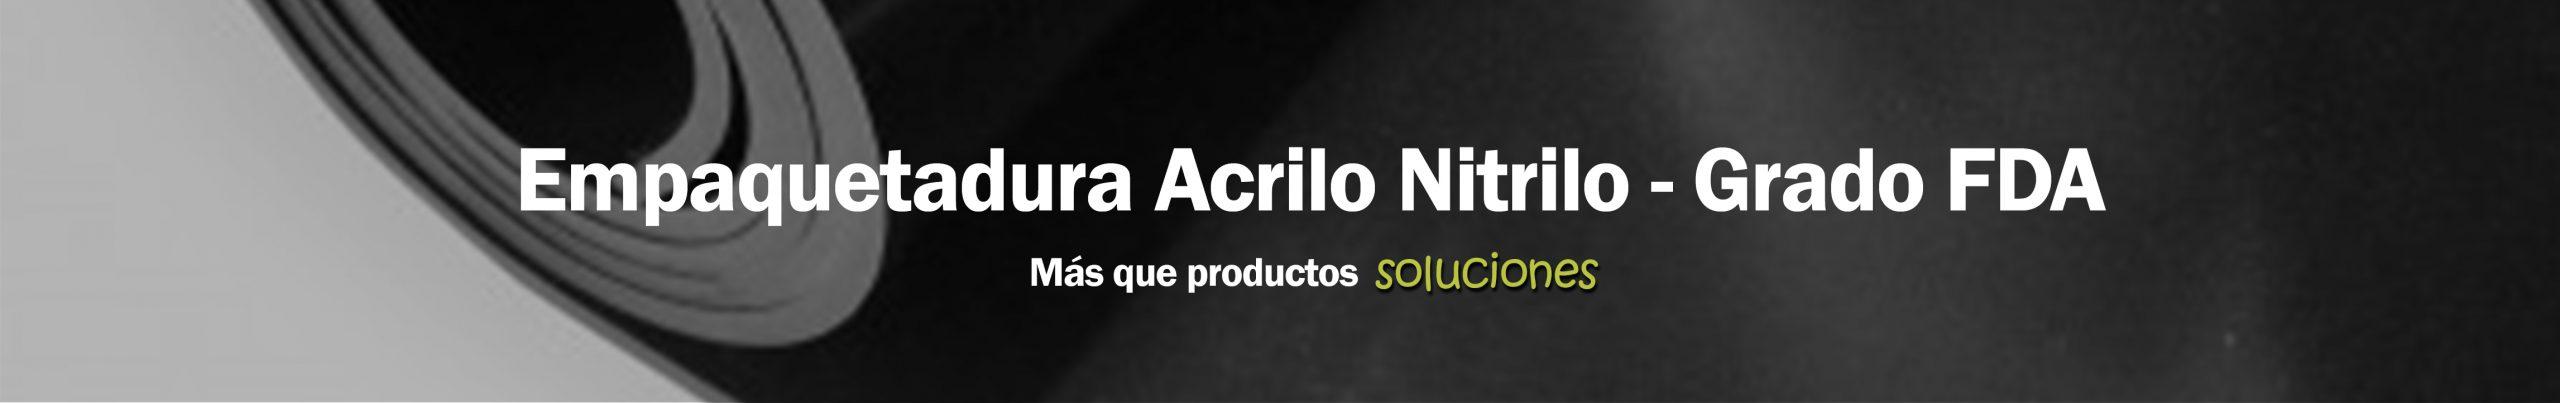 Empaquetadura Acrilo Nitrilo-Grado FDA